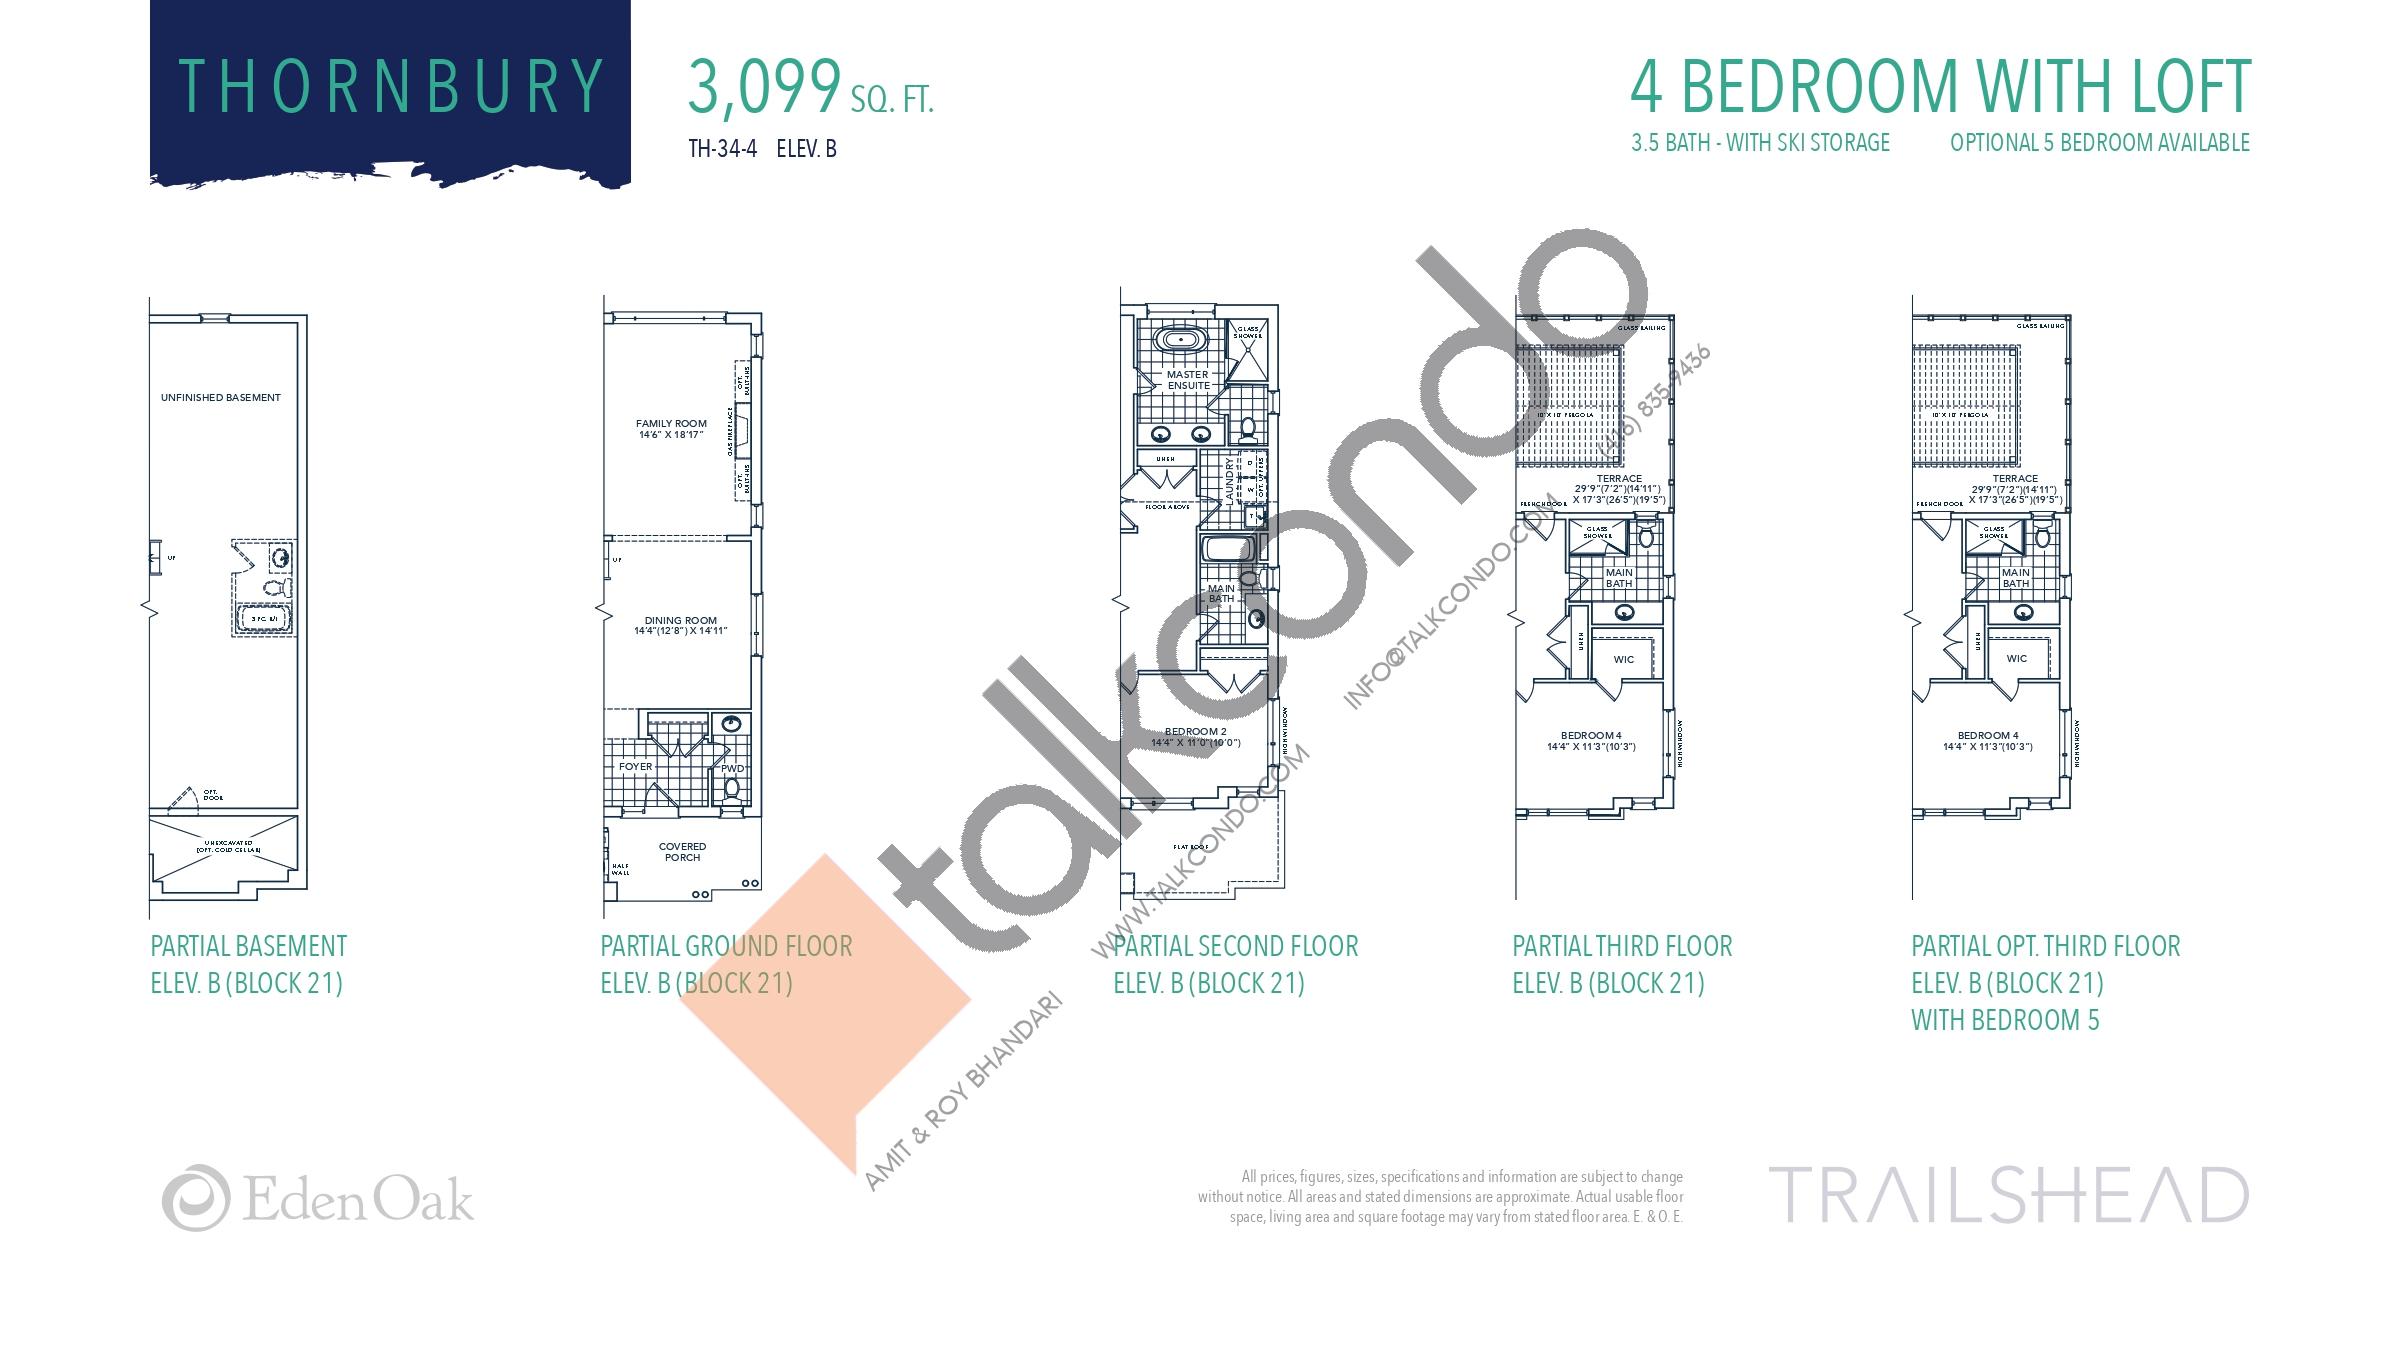 Thornbury (6/6) Floor Plan at Trailshead Towns - 3099 sq.ft